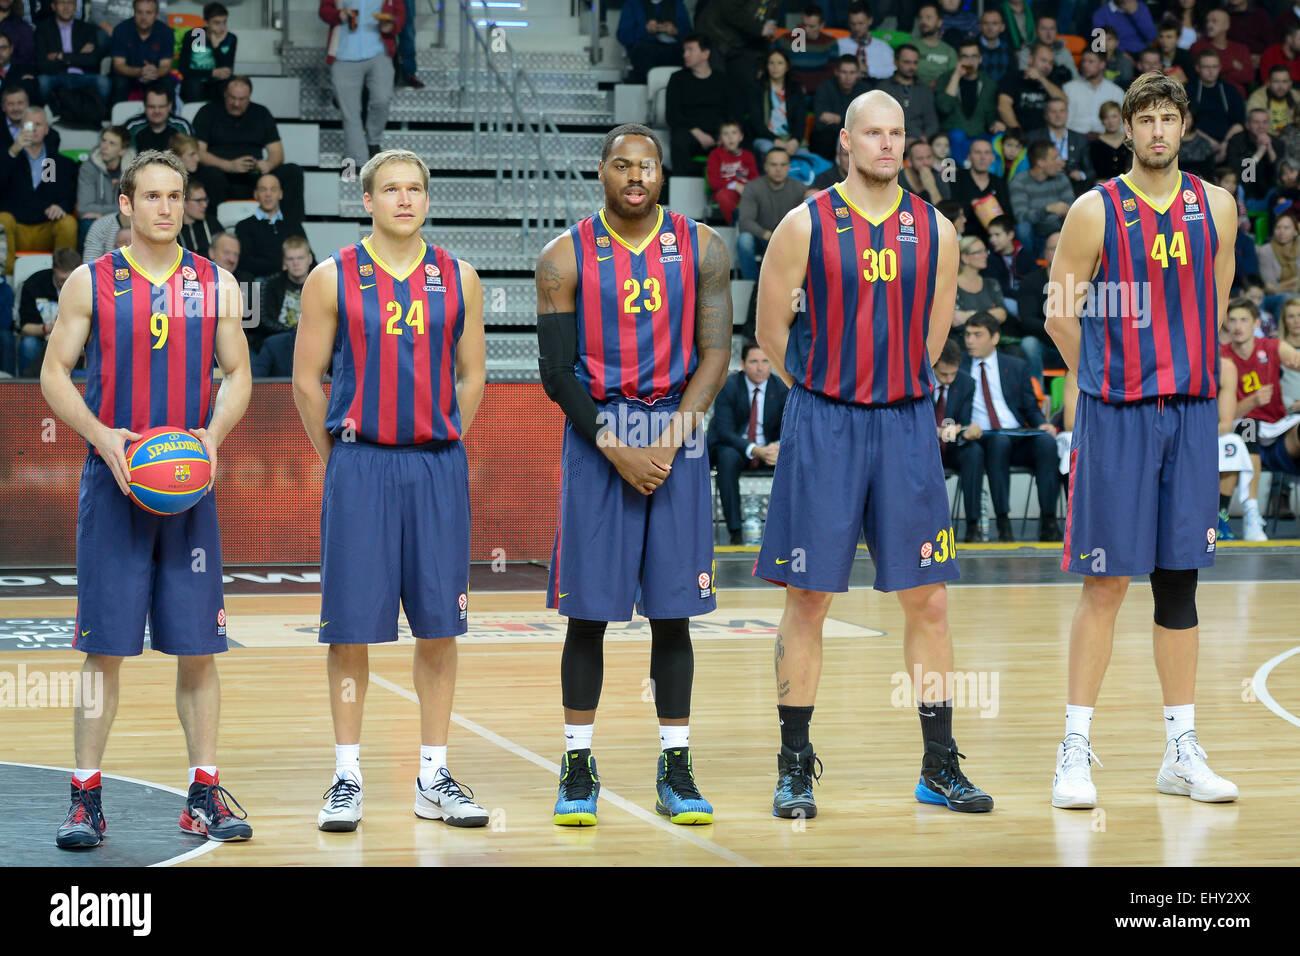 LUBIN, POLAND - DECEMBER 5, 2014: Team of FC Barcelona before the Euroleague basketball match - Stock Image